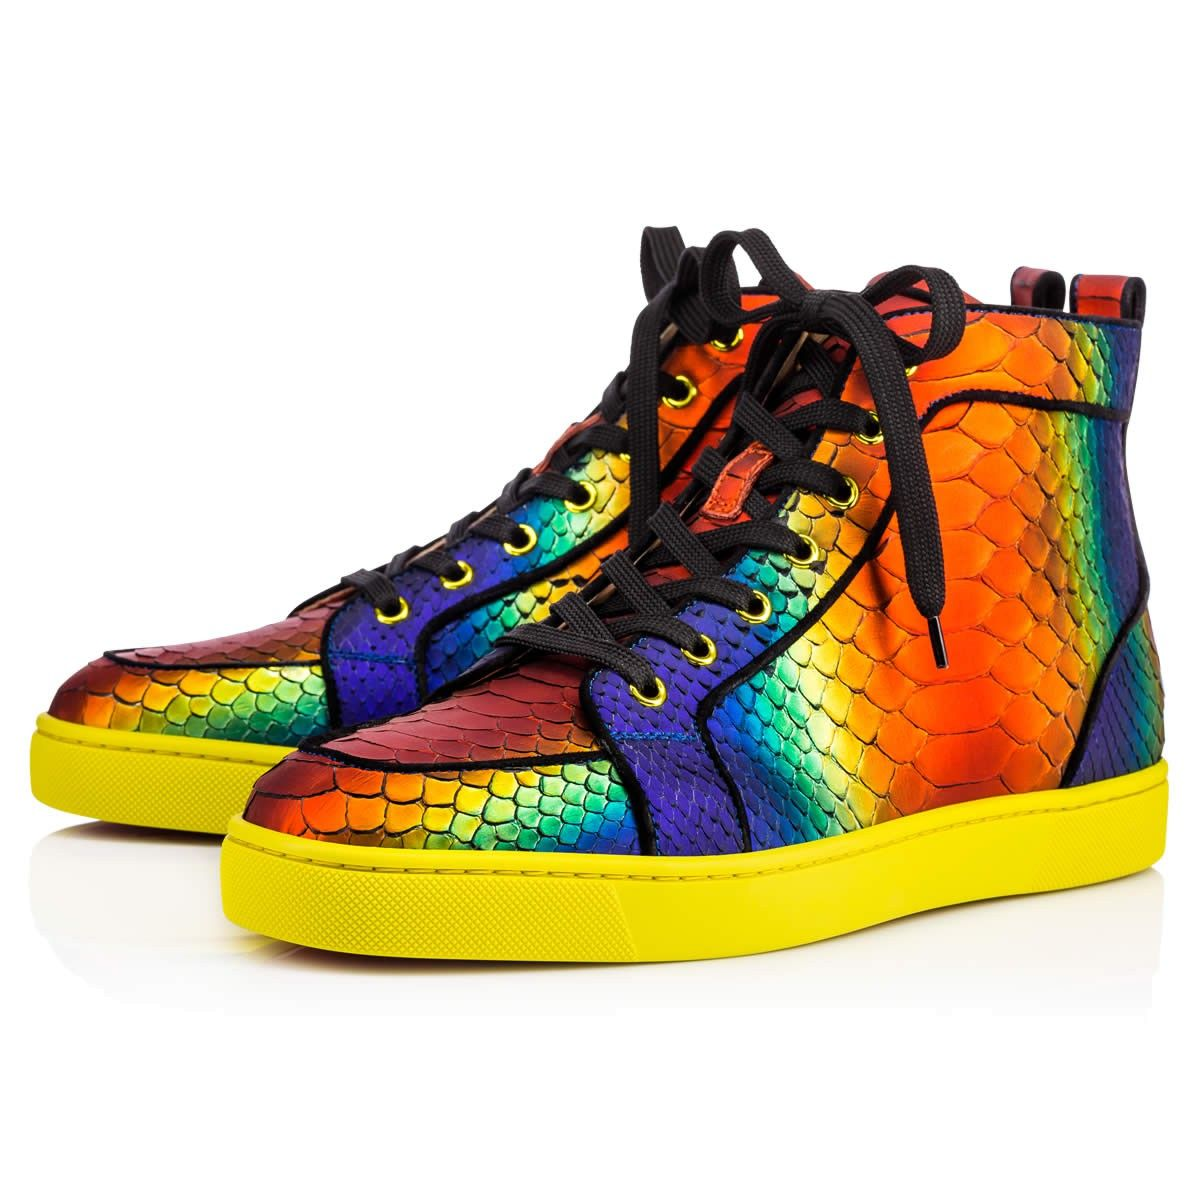 1093370078d Christian Louboutin Rantus Orlato Mens Flat sneakers in rainbow ...